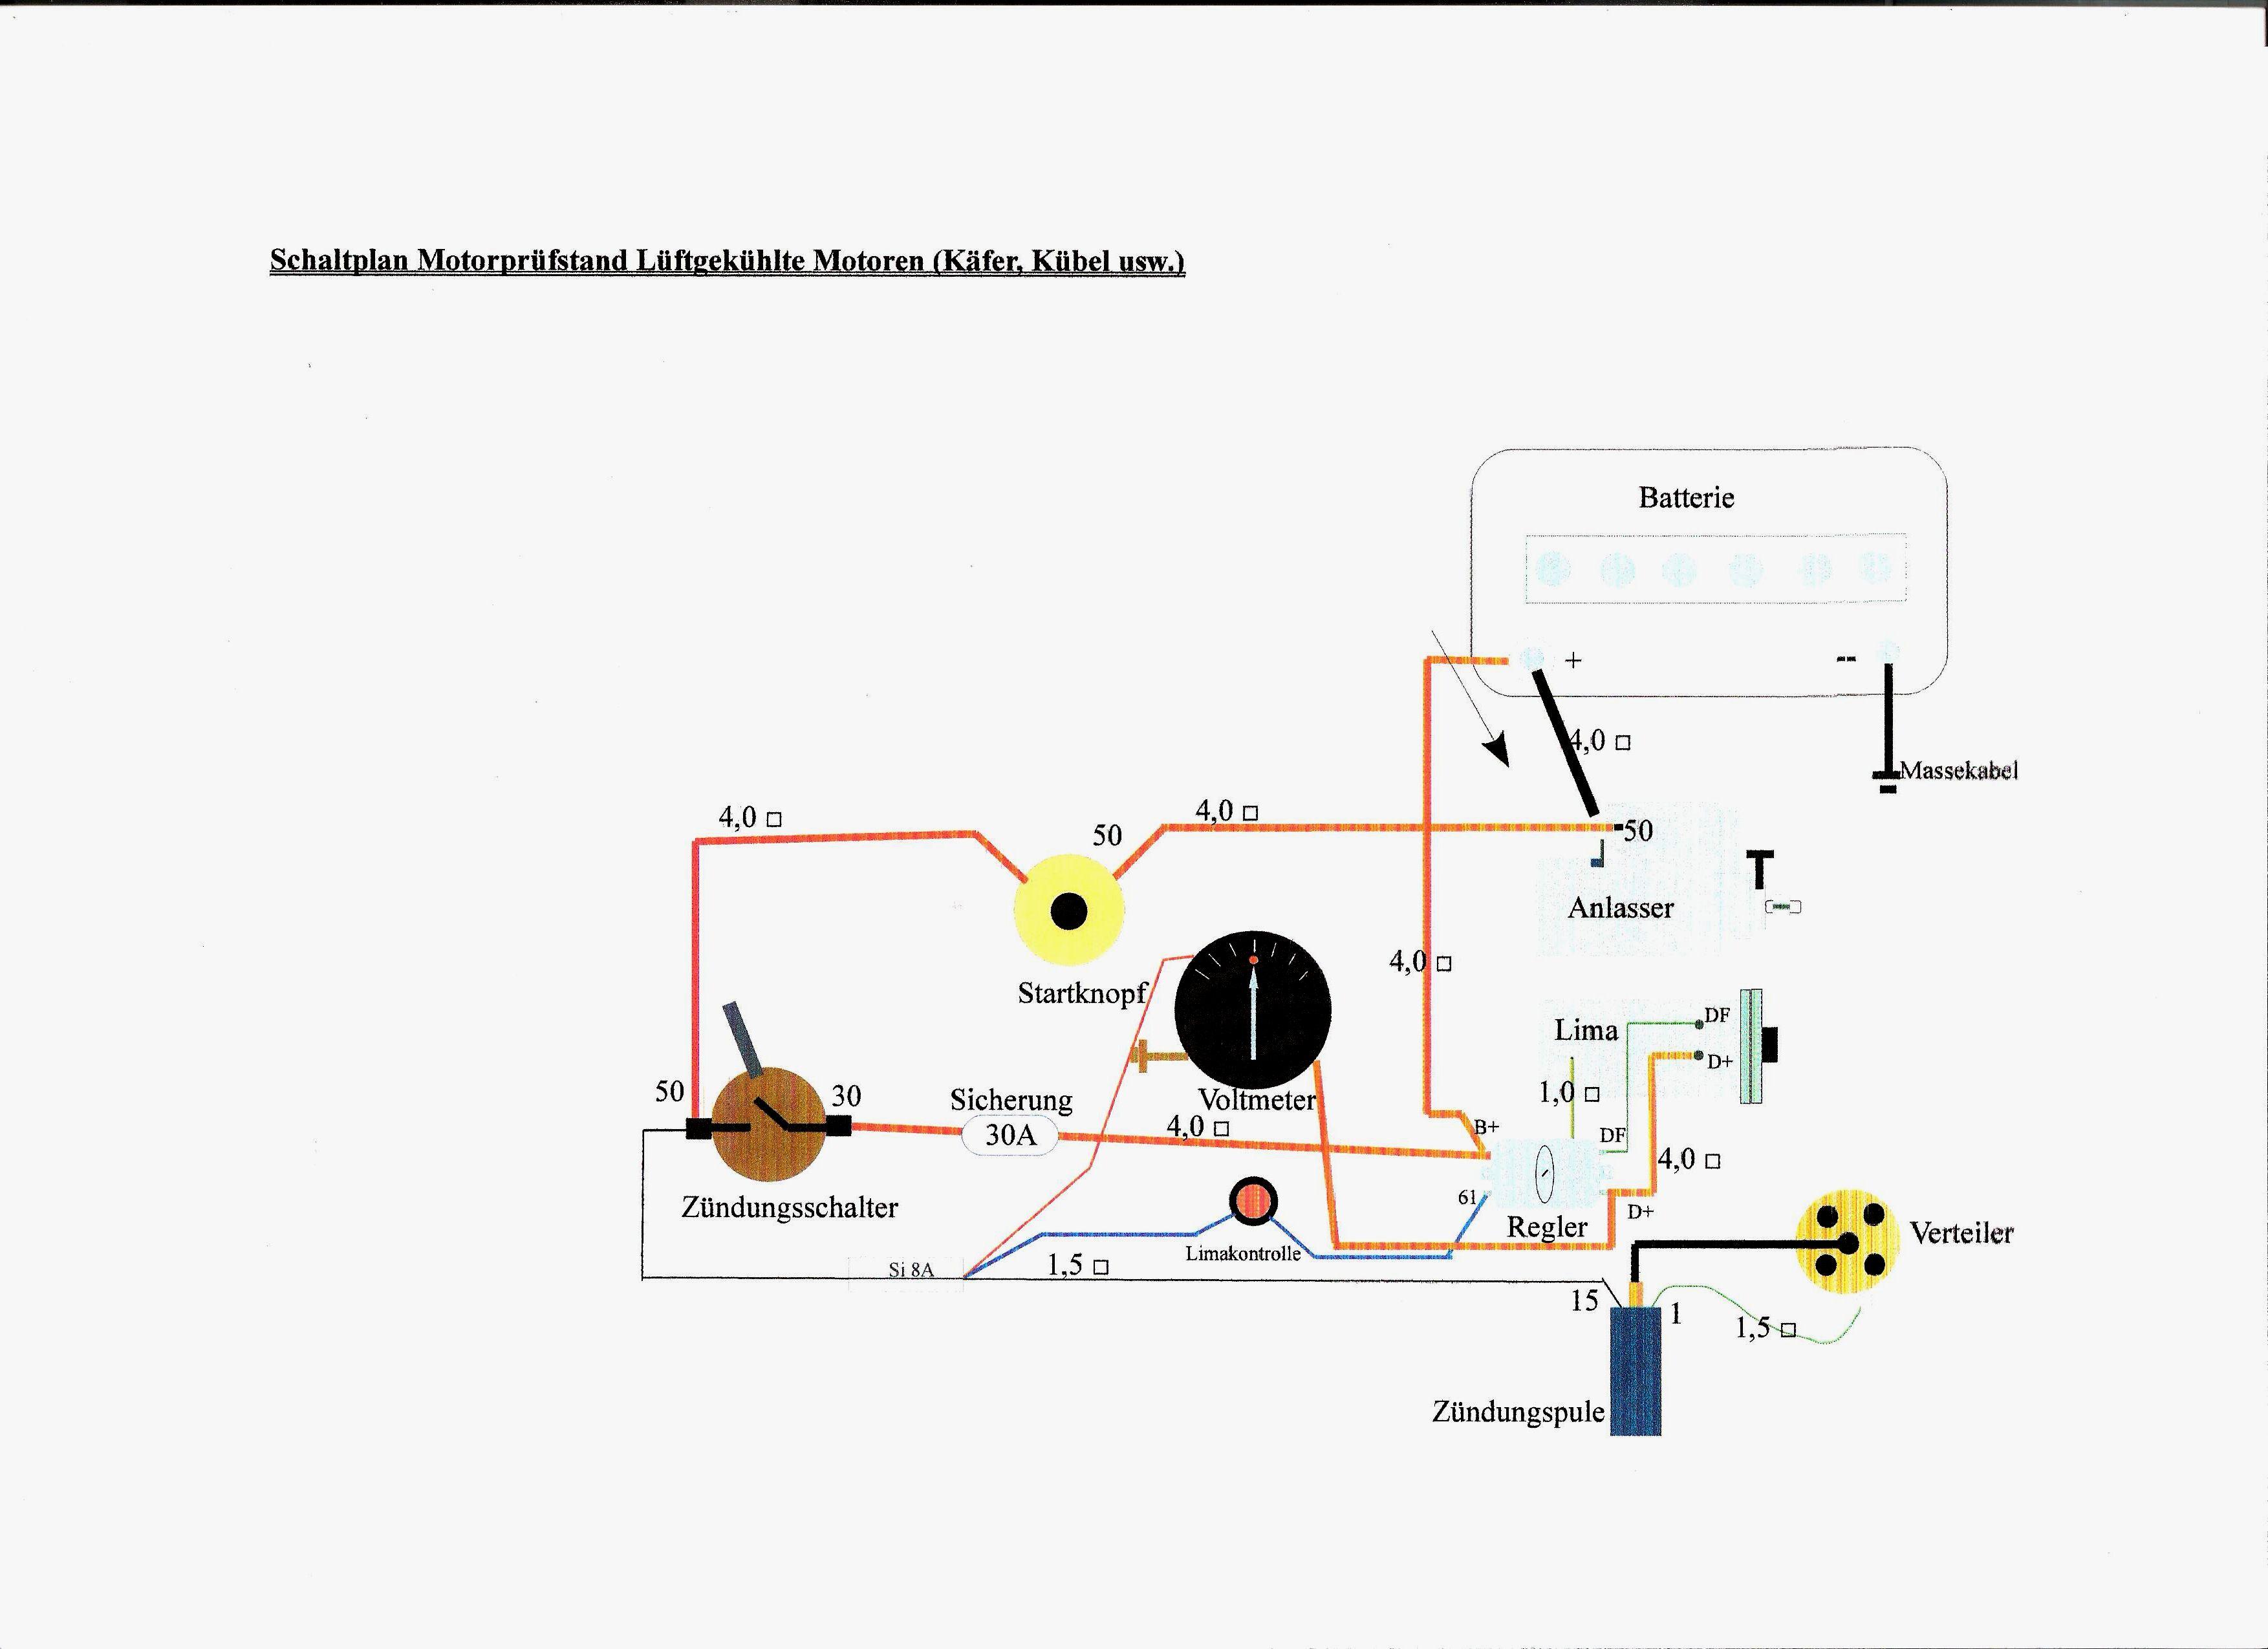 Beste Gould Jahrhundert Motor Schaltplan Fotos - Elektrische ...